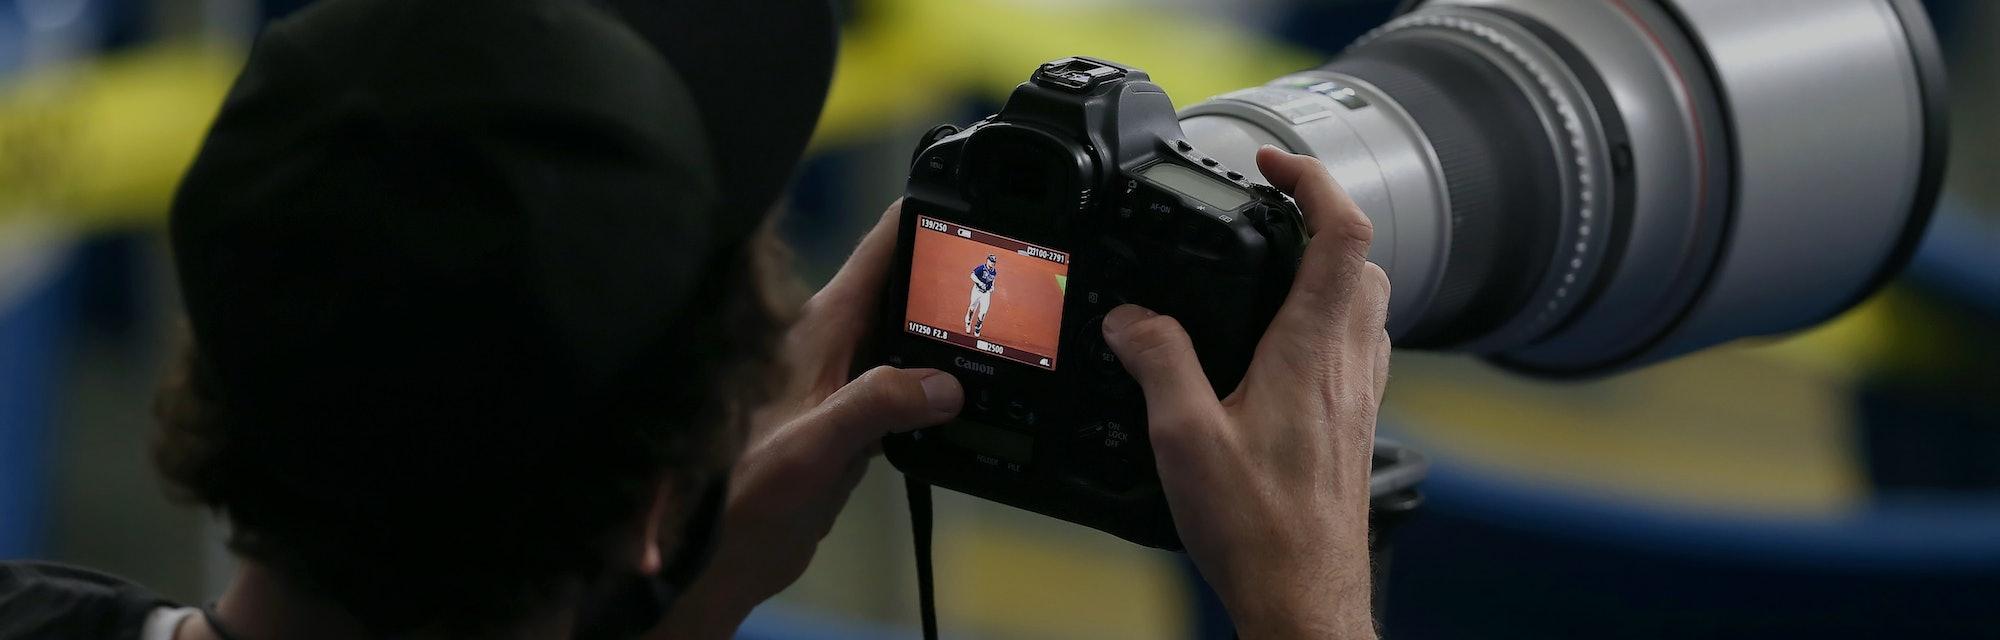 Photographer holding a DSLR camera.